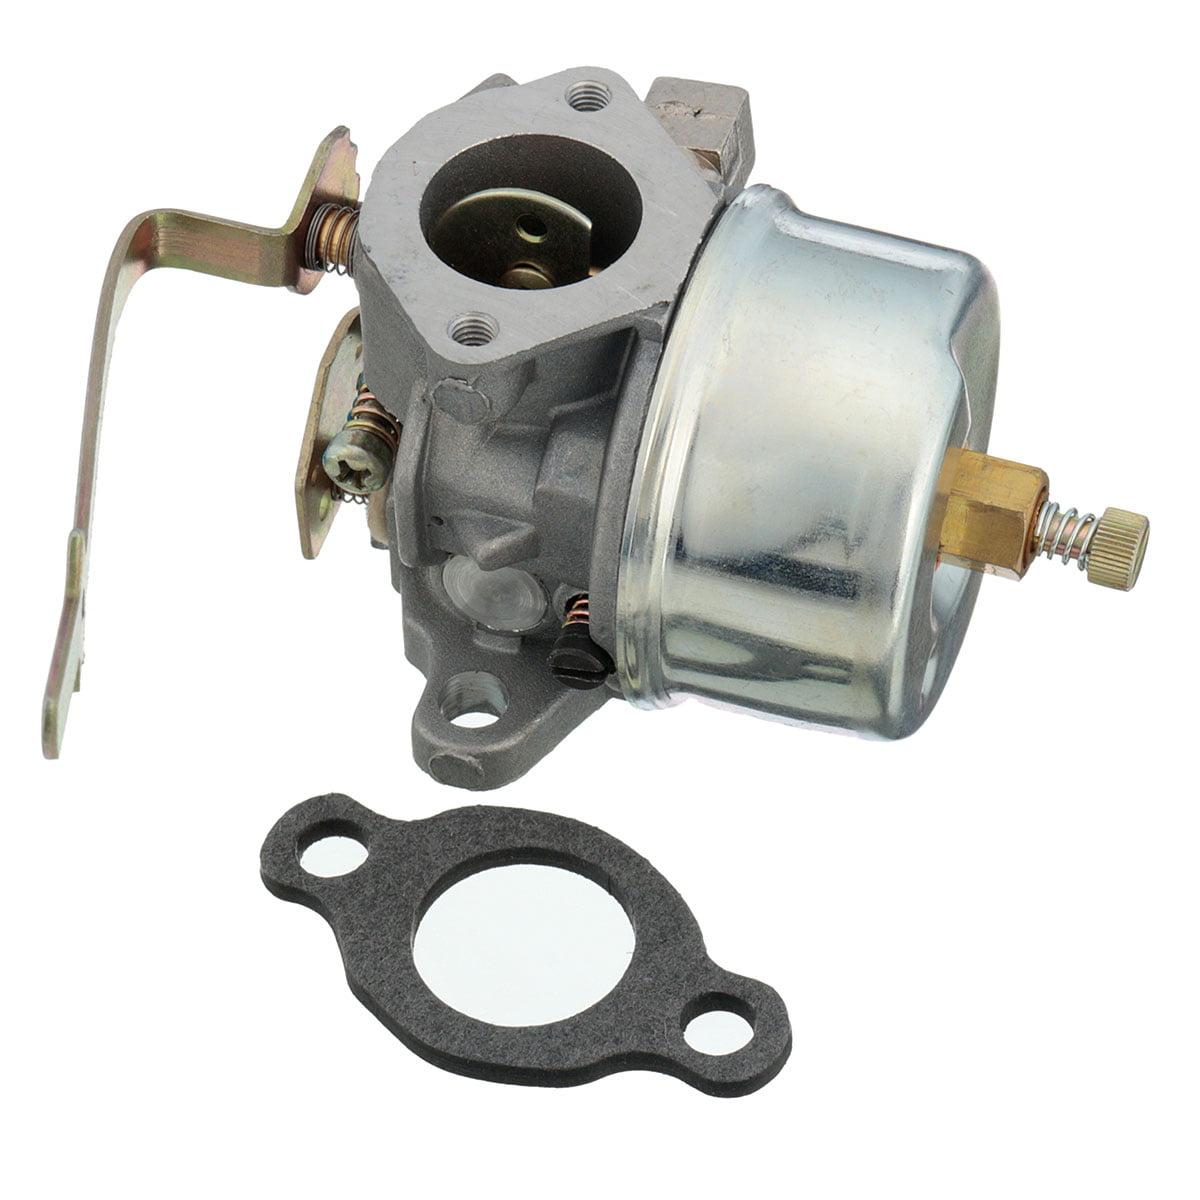 Carburetor Carb For Tecumseh 631918 HS40 4HP HS50 5HP Engine Free Gasket by